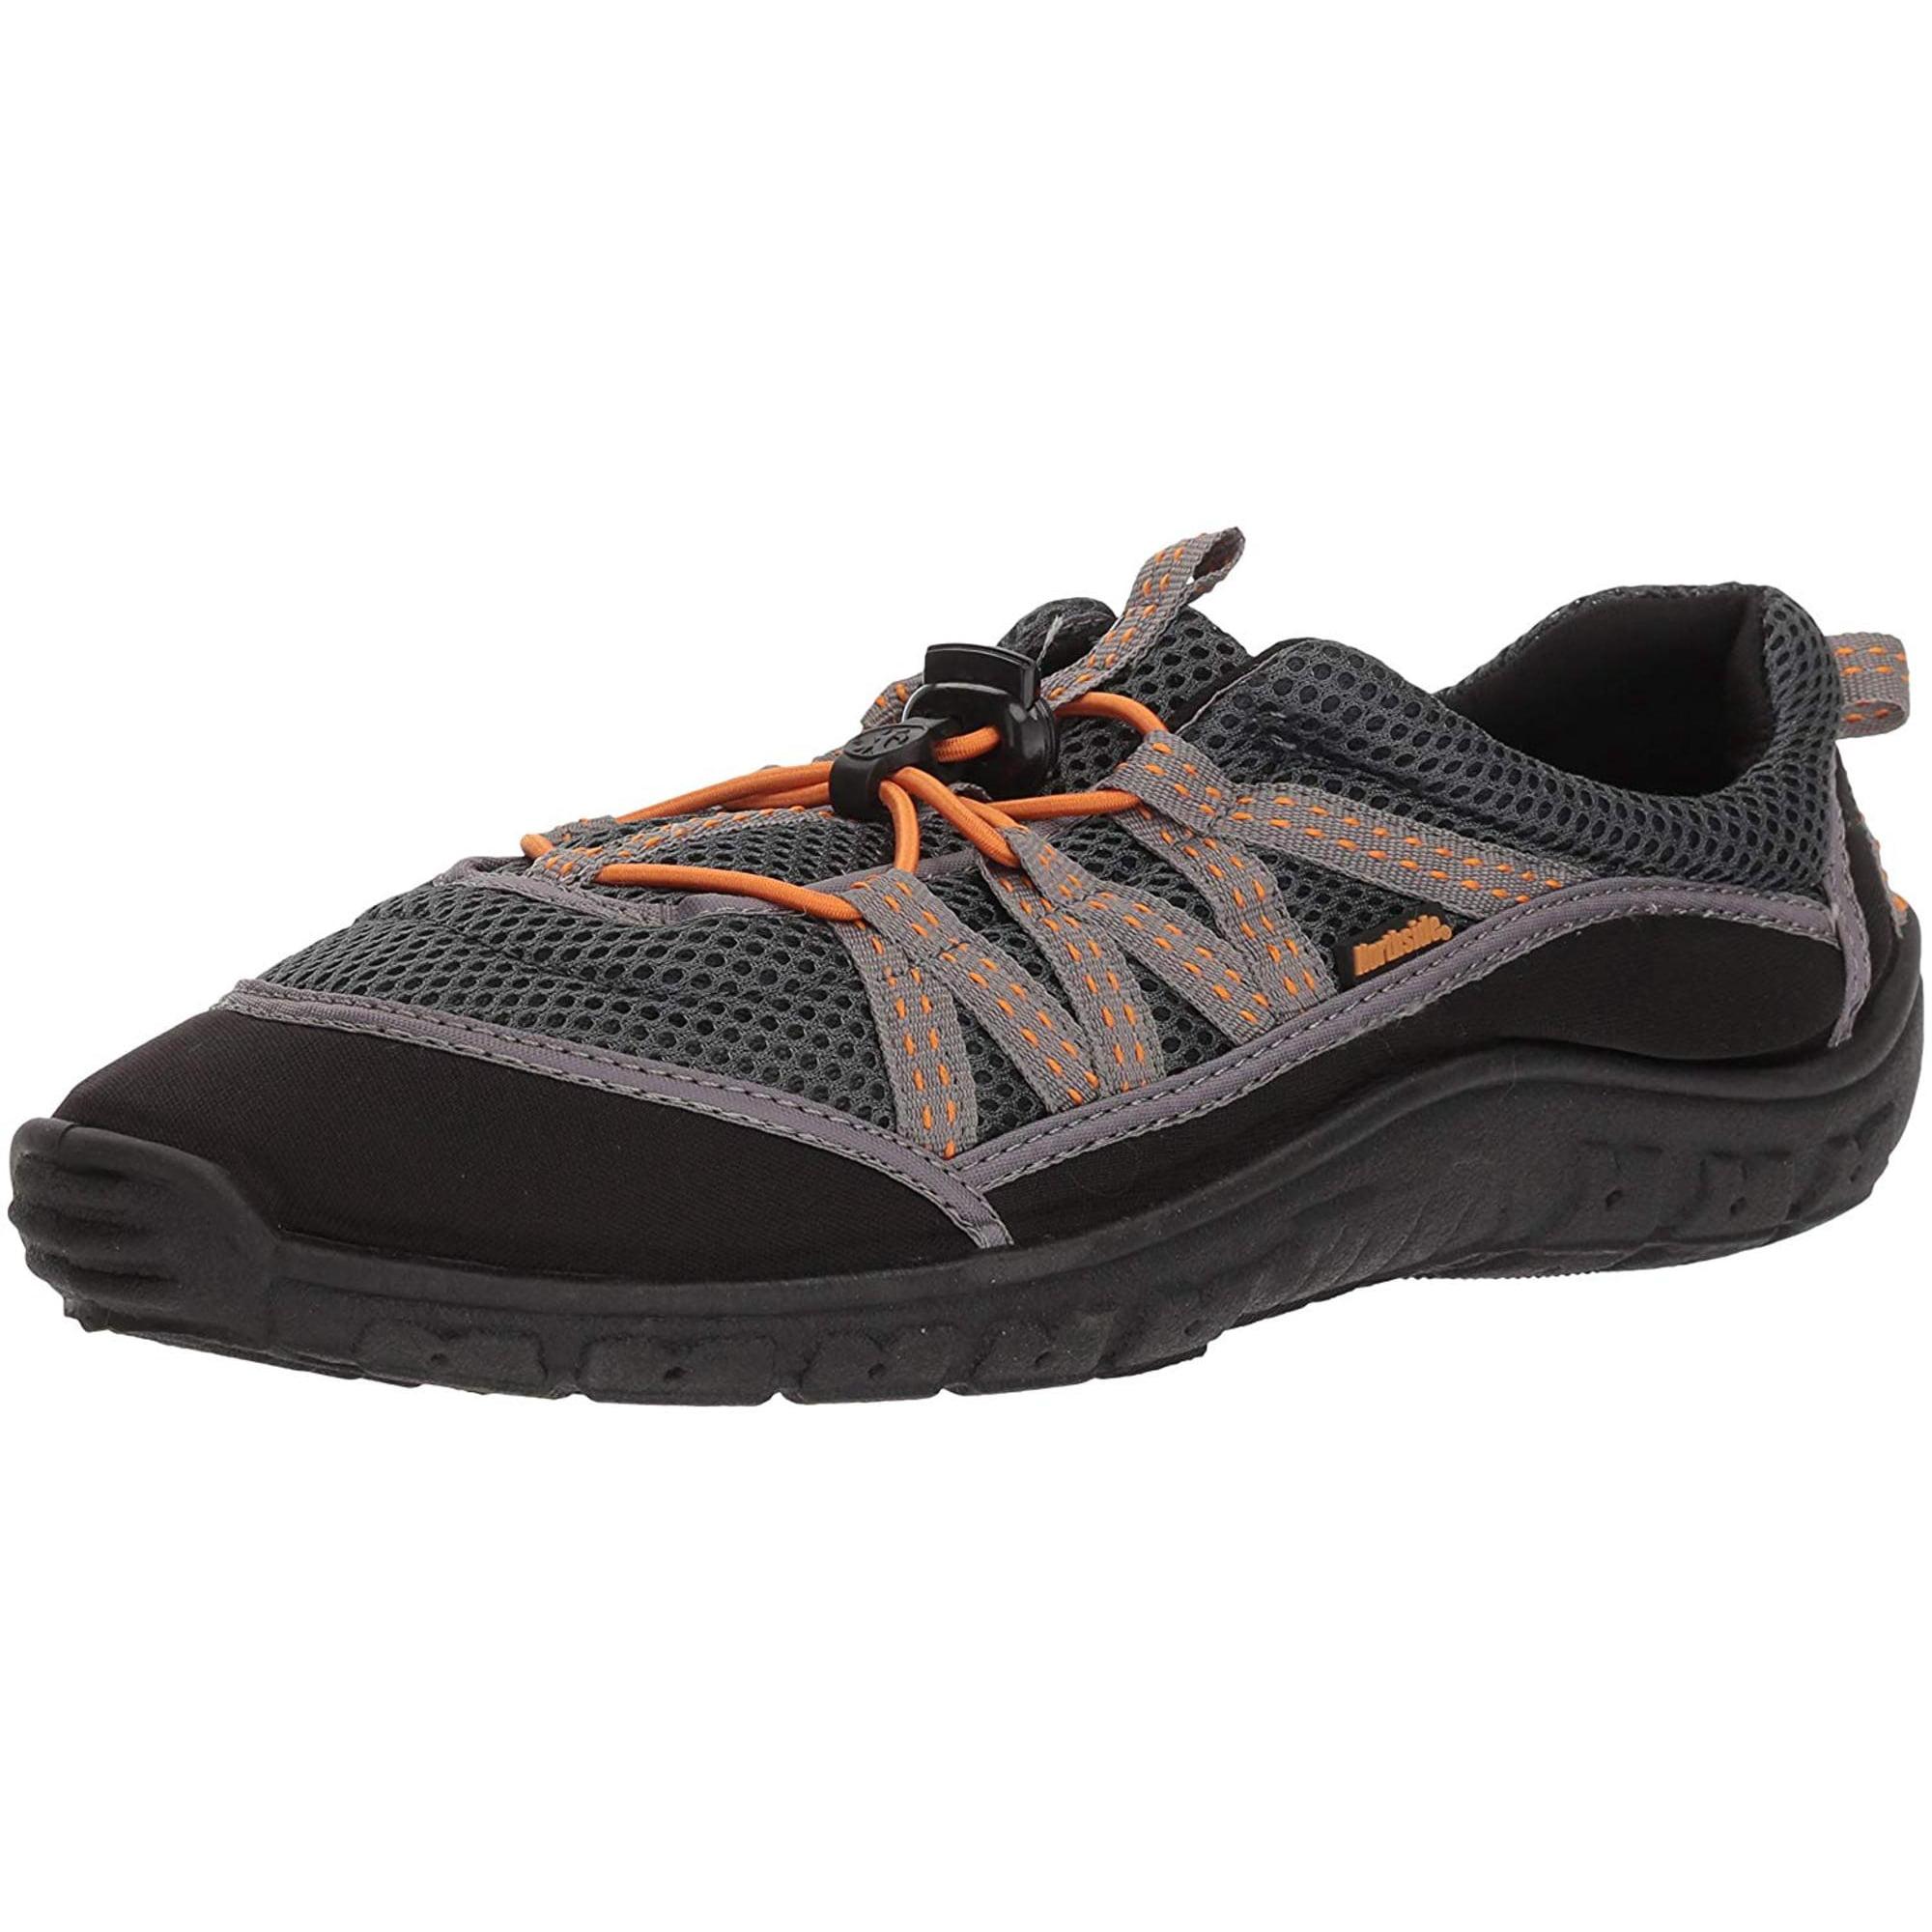 27337eda52b9 Northside Unisex Brille II Womens Mens Athletic Water Shoe